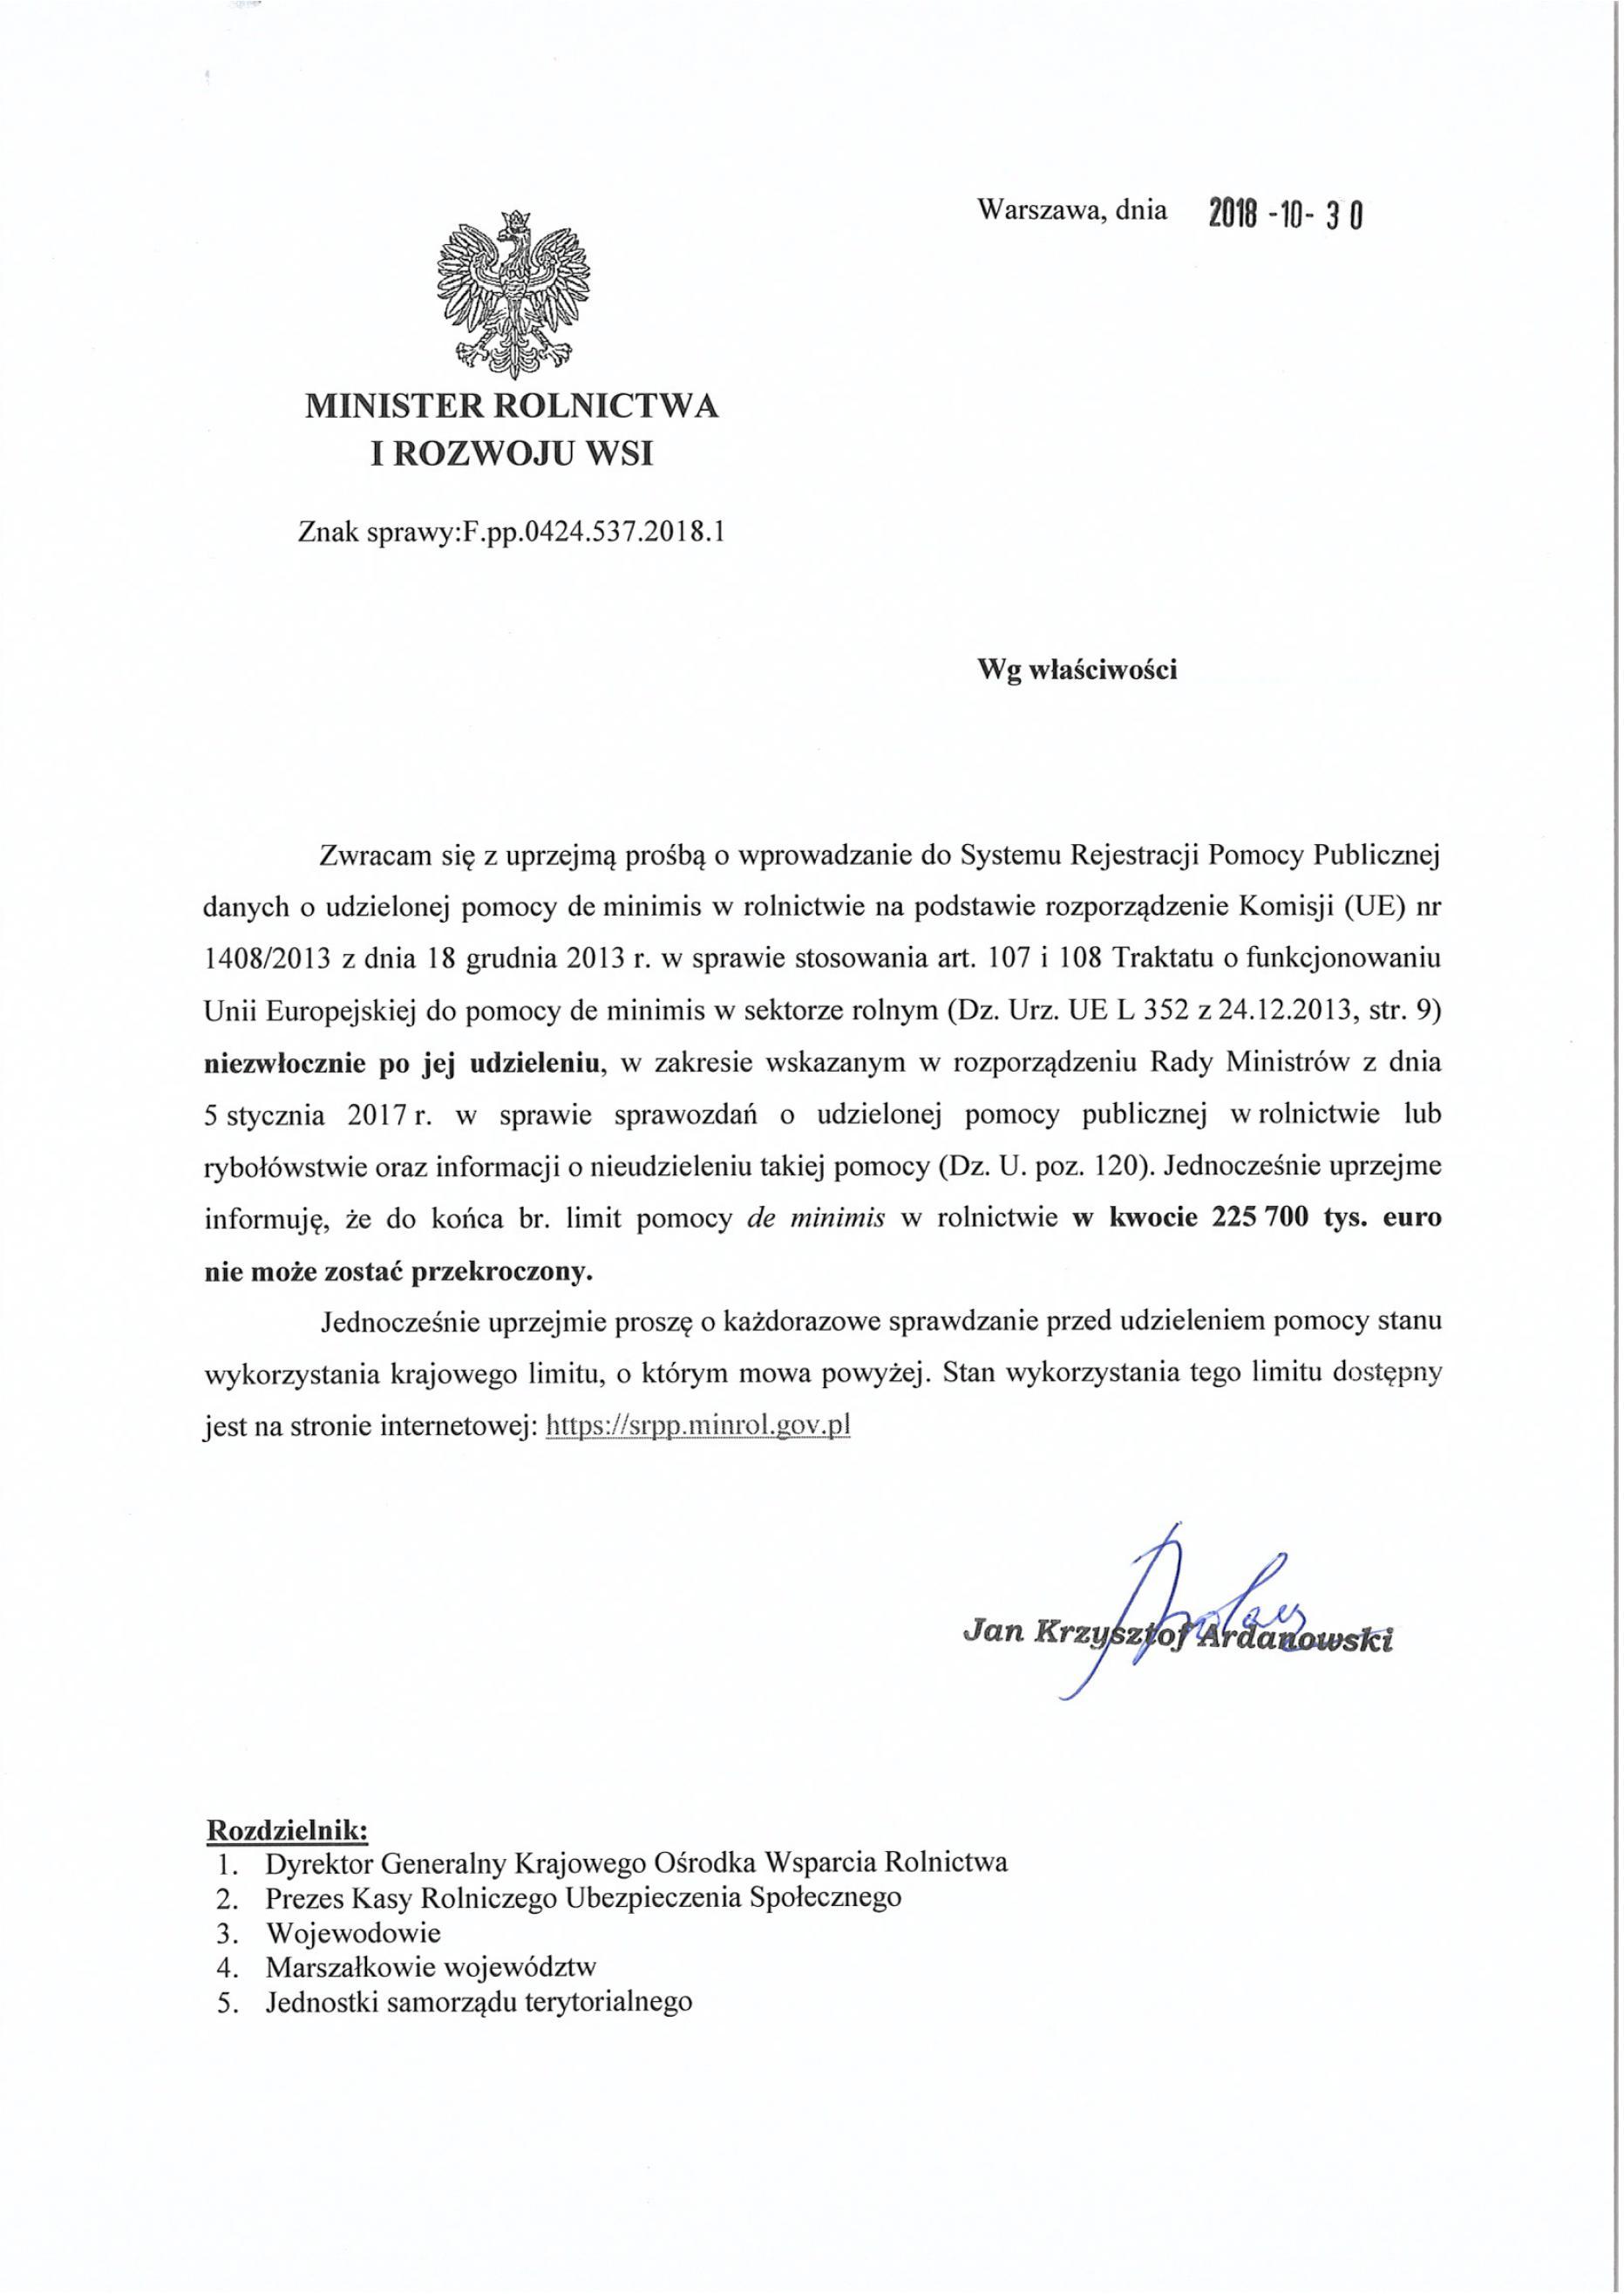 Pismo MRiRW_F.pp.0424.537.2018.1_NewScan20181030085726_01